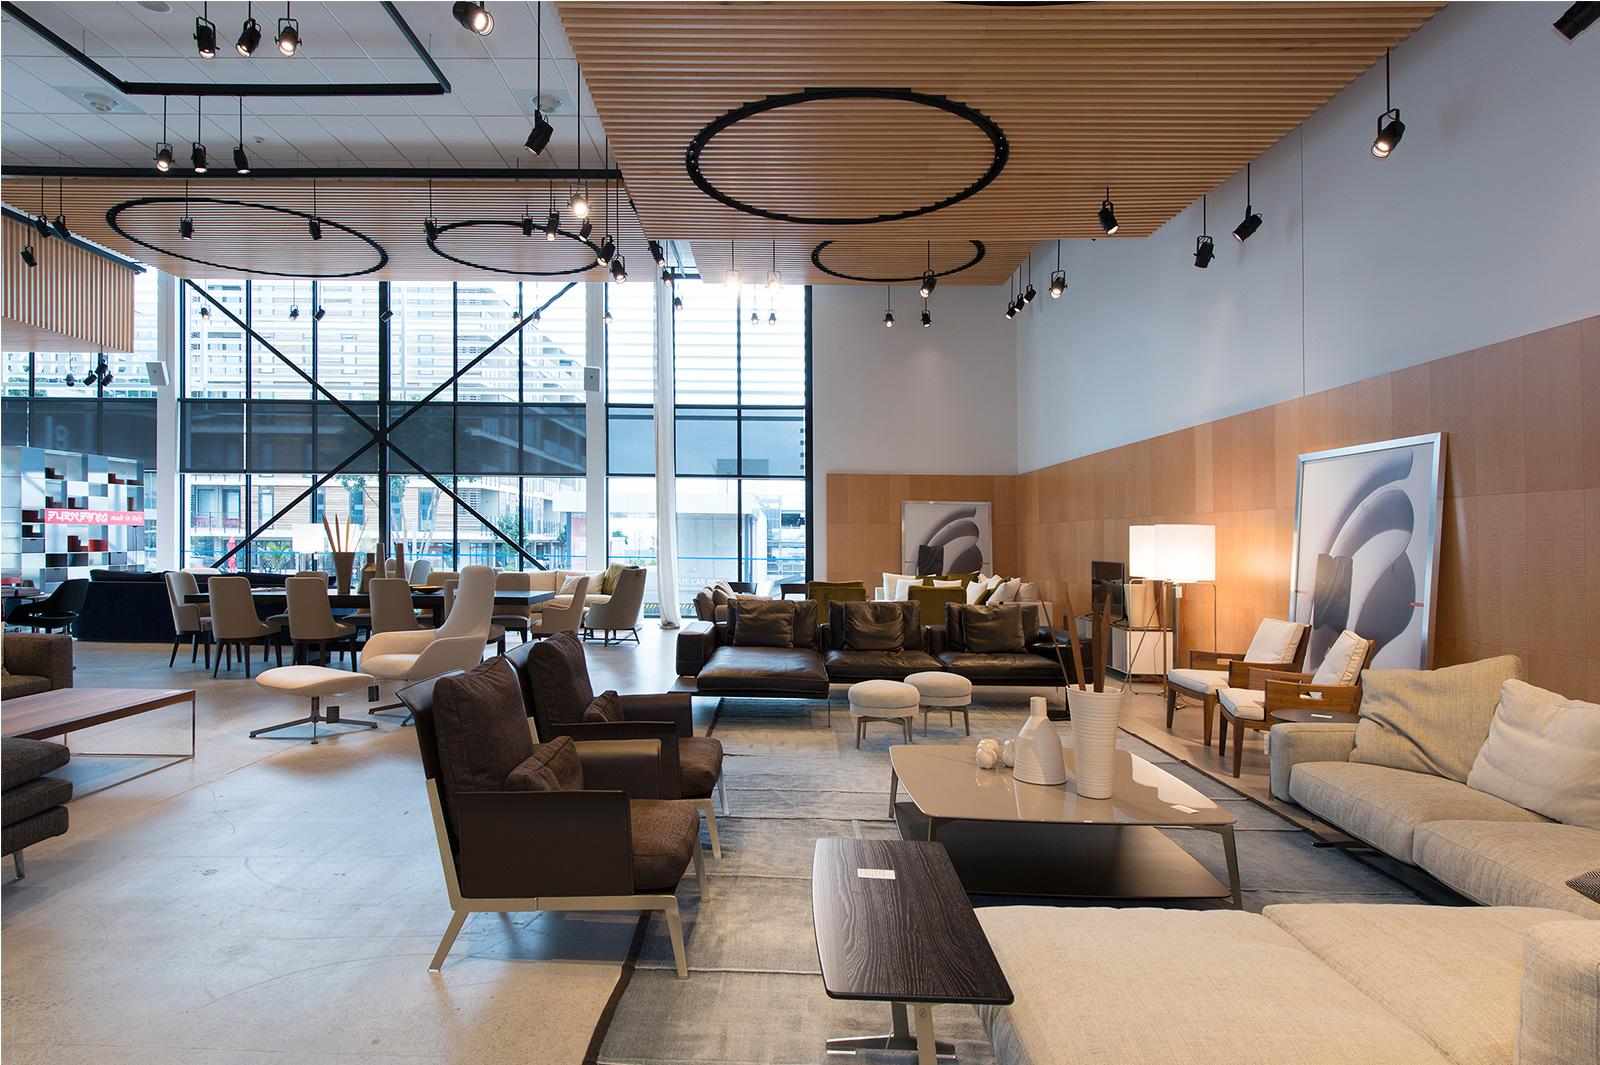 Construction-Company-Aspec-Studio-Italia-Retail-Fitout-3